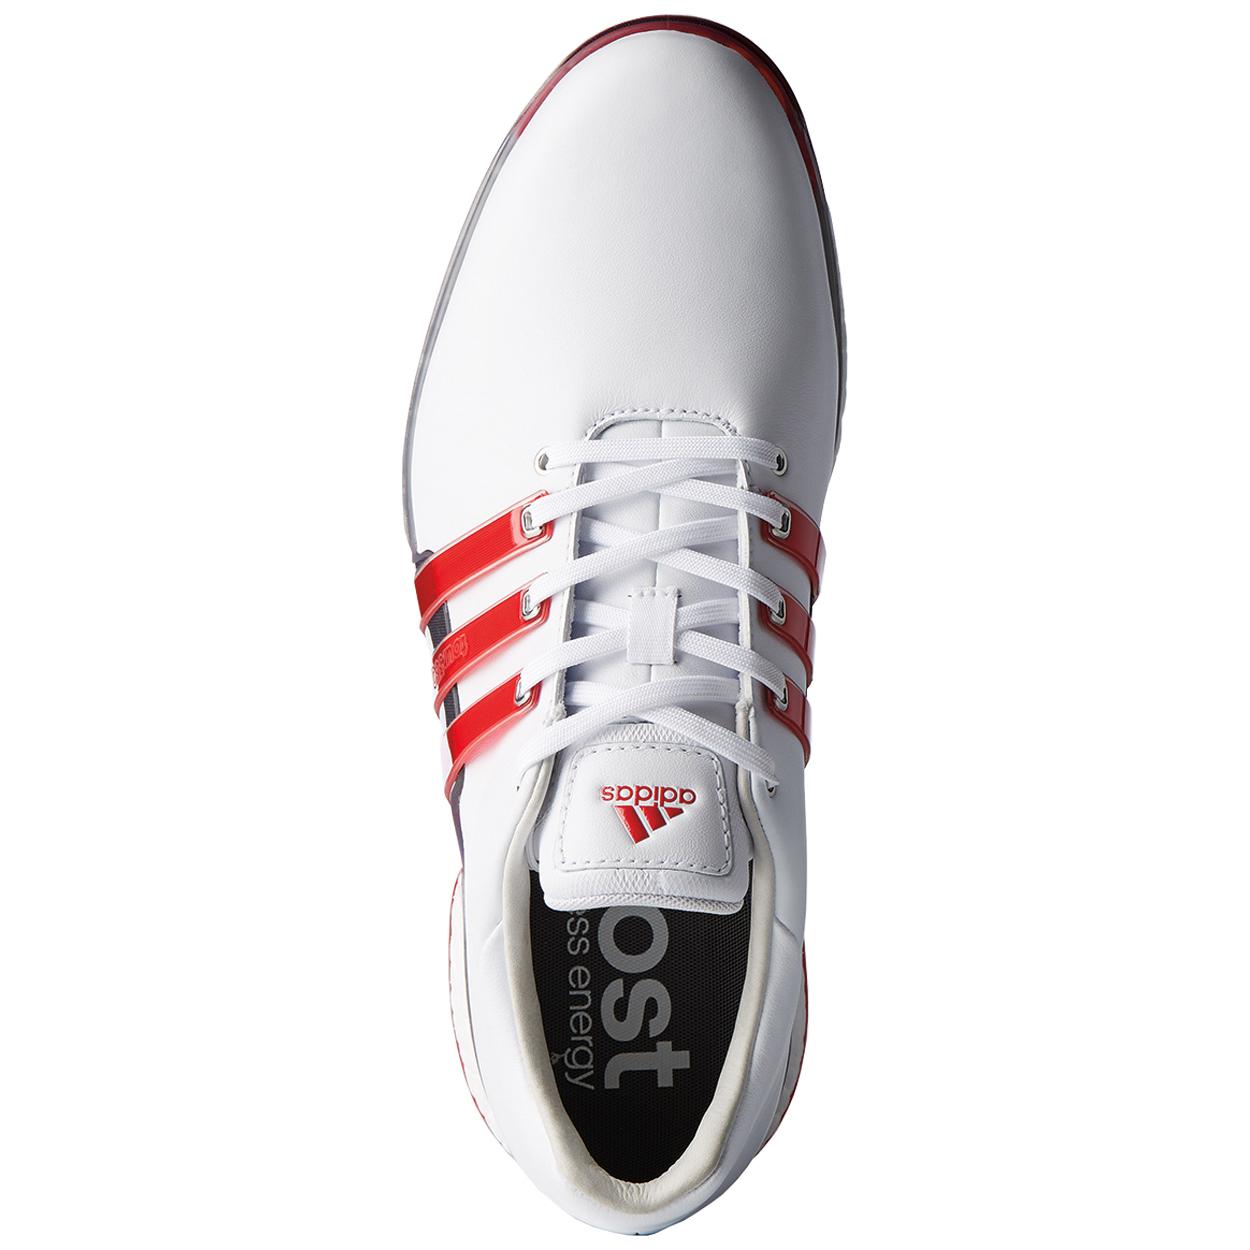 Adidas-Tour-360-2-0-Zapatos-De-Golf-De-Cuero-A-ESTRENAR miniatura 15